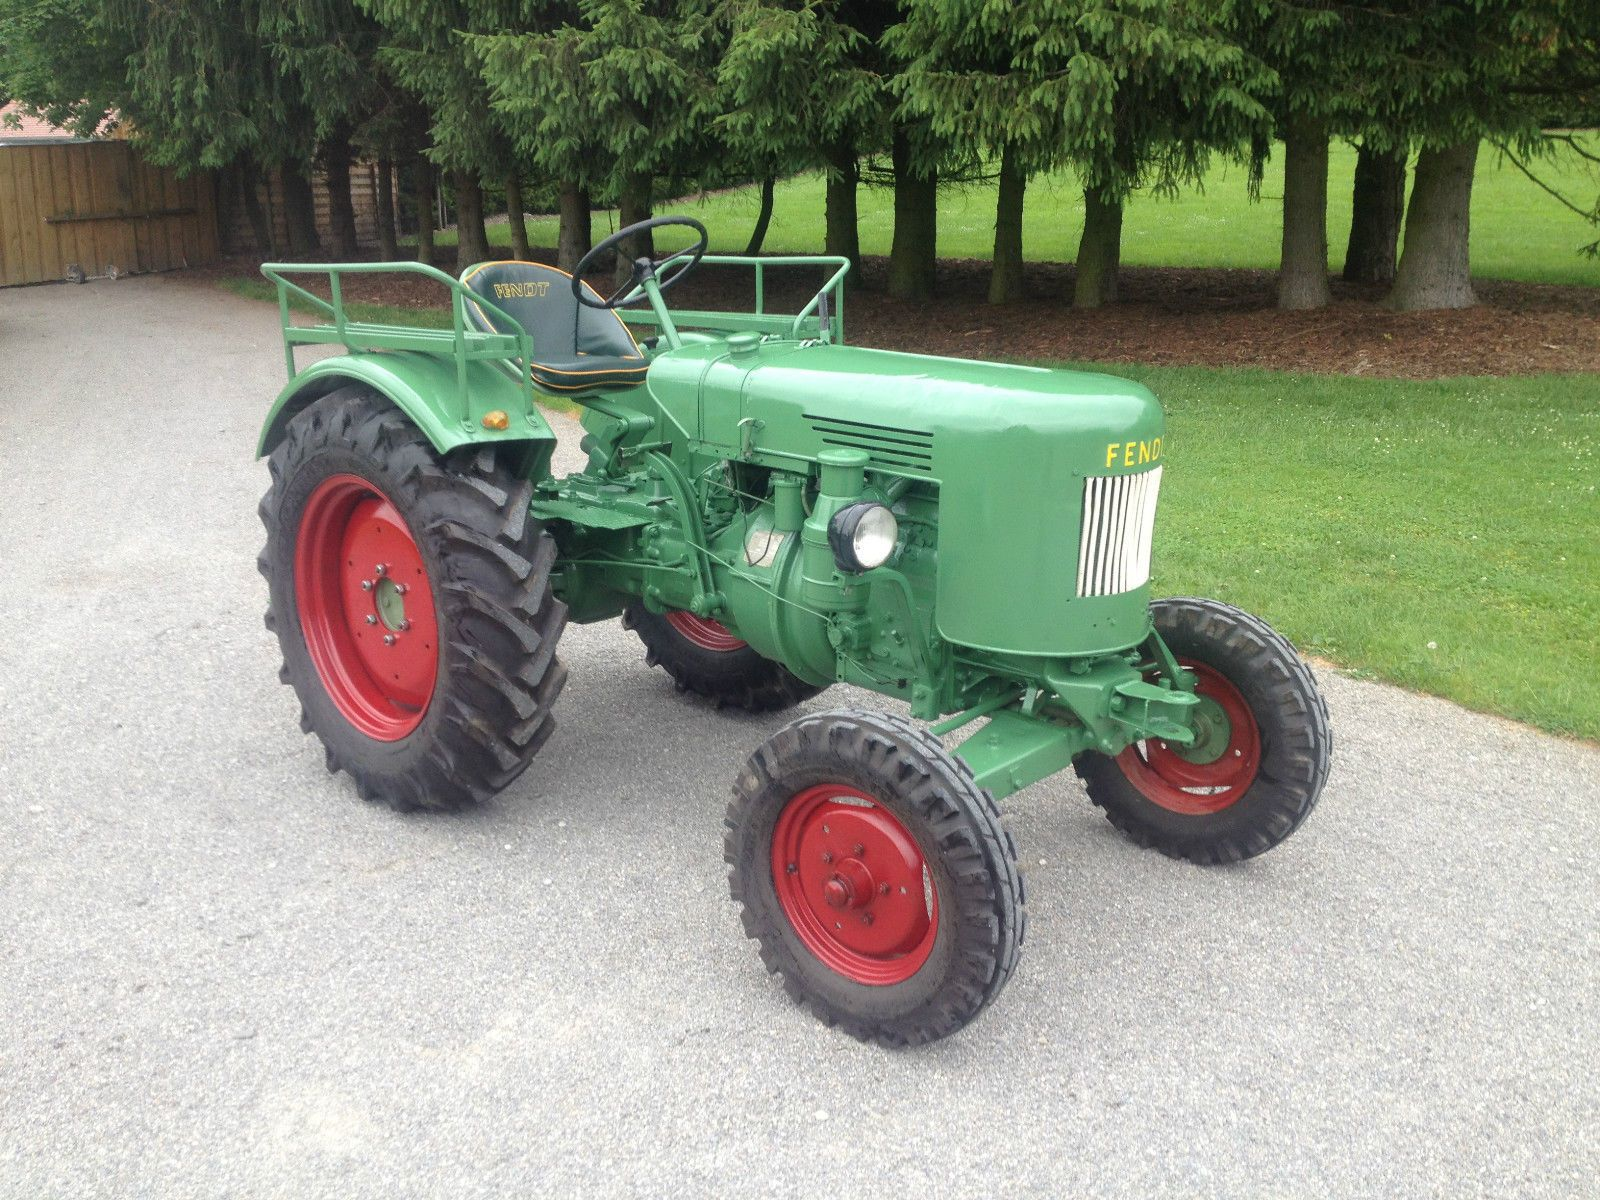 Fendt Dieselross F24 Wag 24ps Bj1956 Hochrad 30kmh Topzustand Tuv Neu Ebay Fendt Hochrad Traktoren